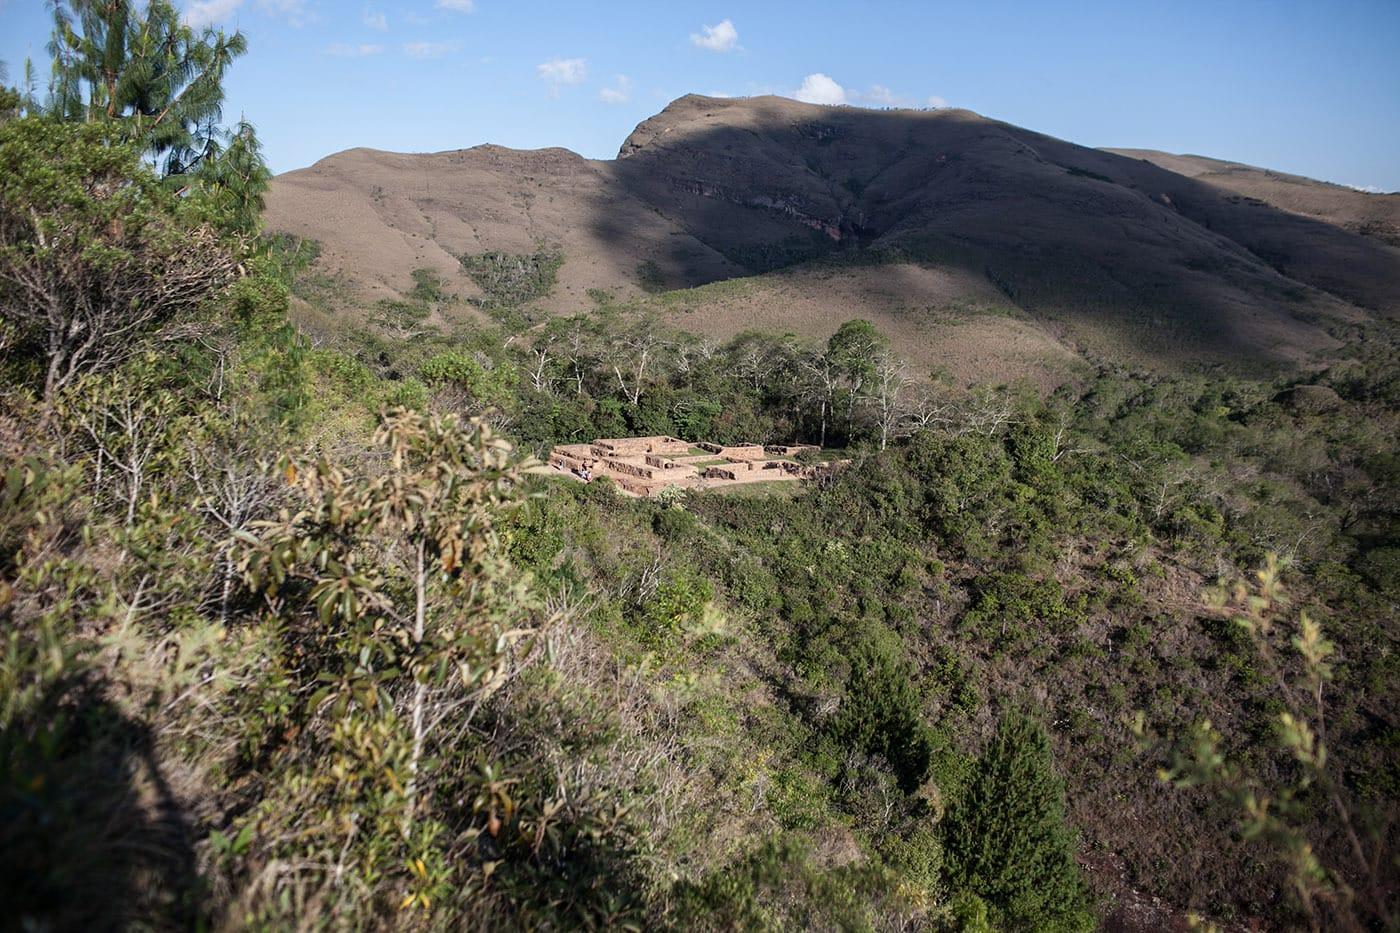 El Fuerte archaeological religious site in Samaipata, Bolivia